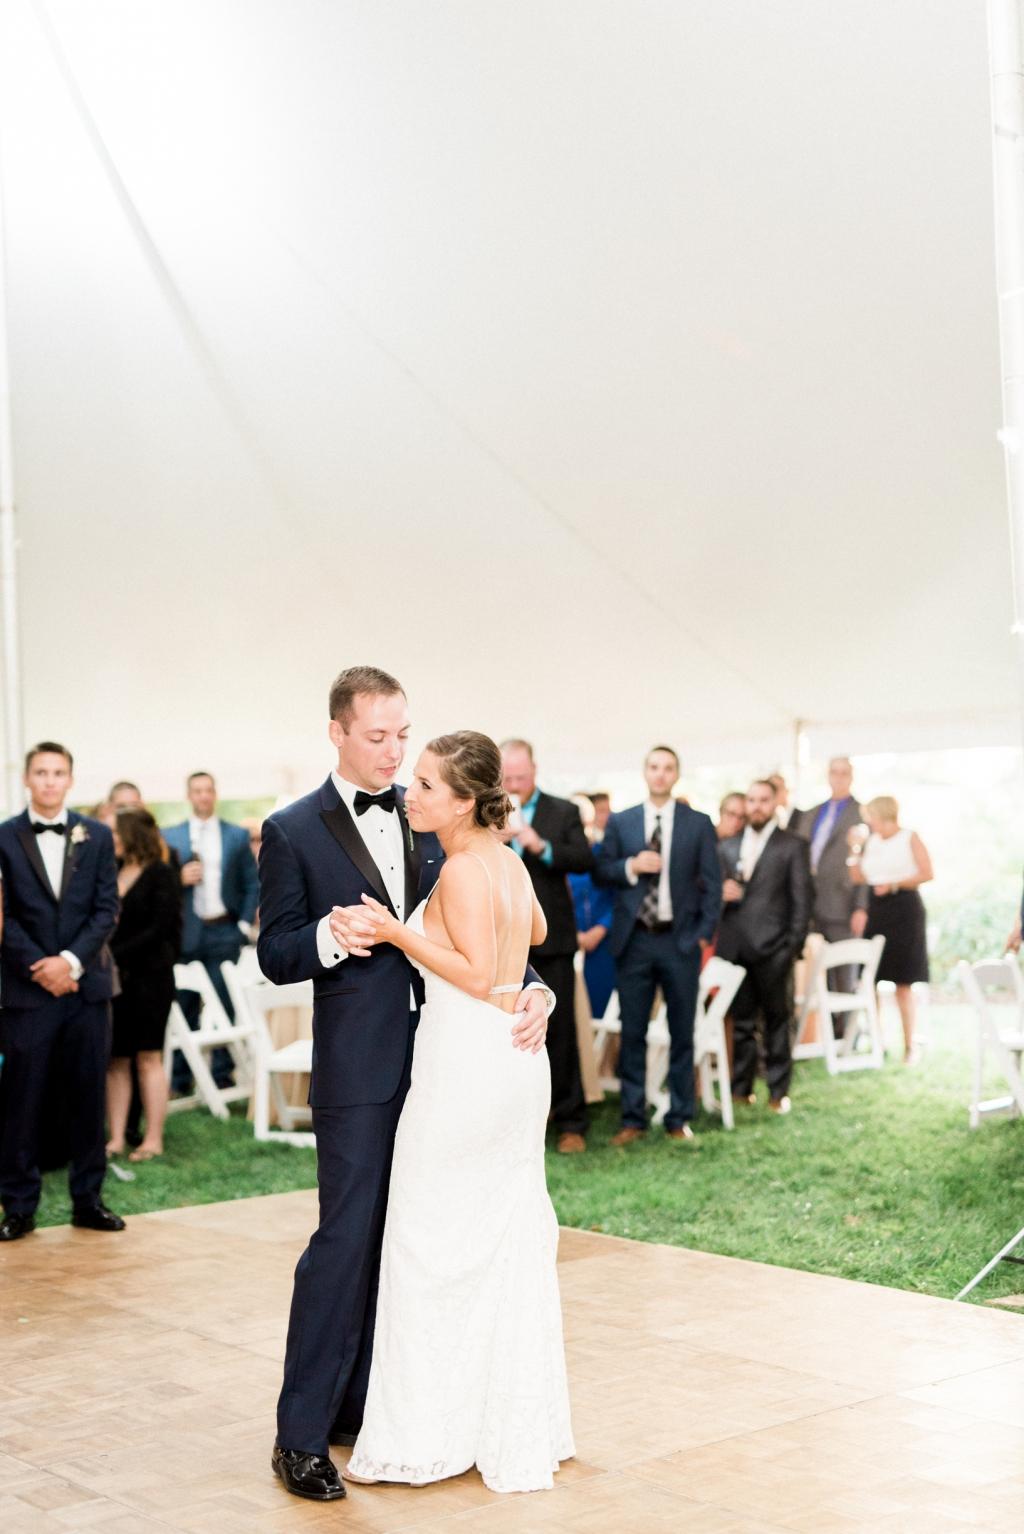 haley-richter-photography-buena-vista-confrence-center-wedding-summer-160